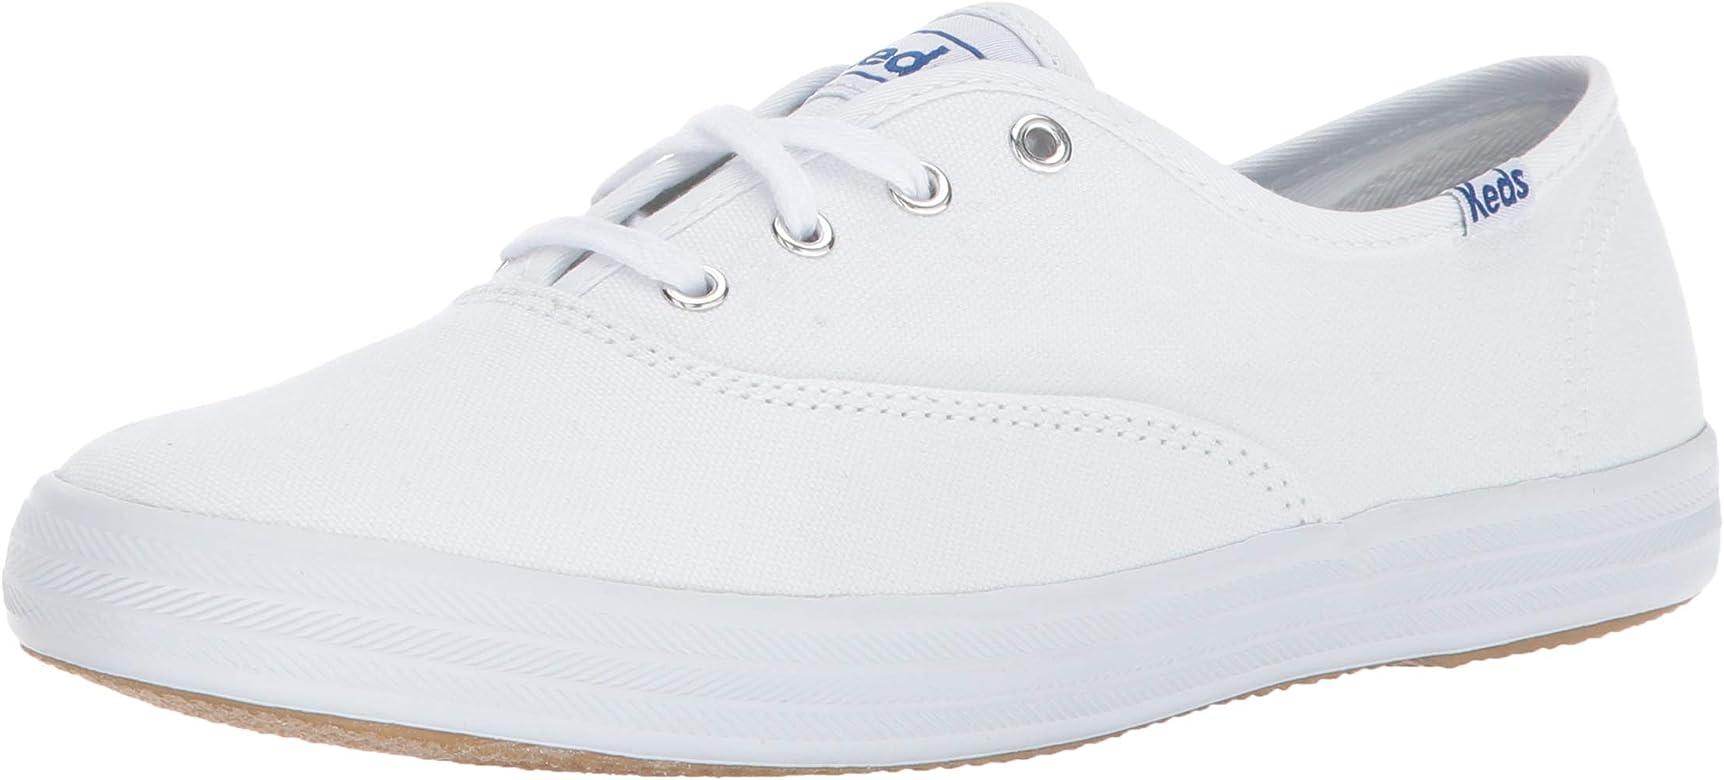 52a5fe49f1 Amazon.com   Keds Women's Champion Original Canvas Sneaker, White ...